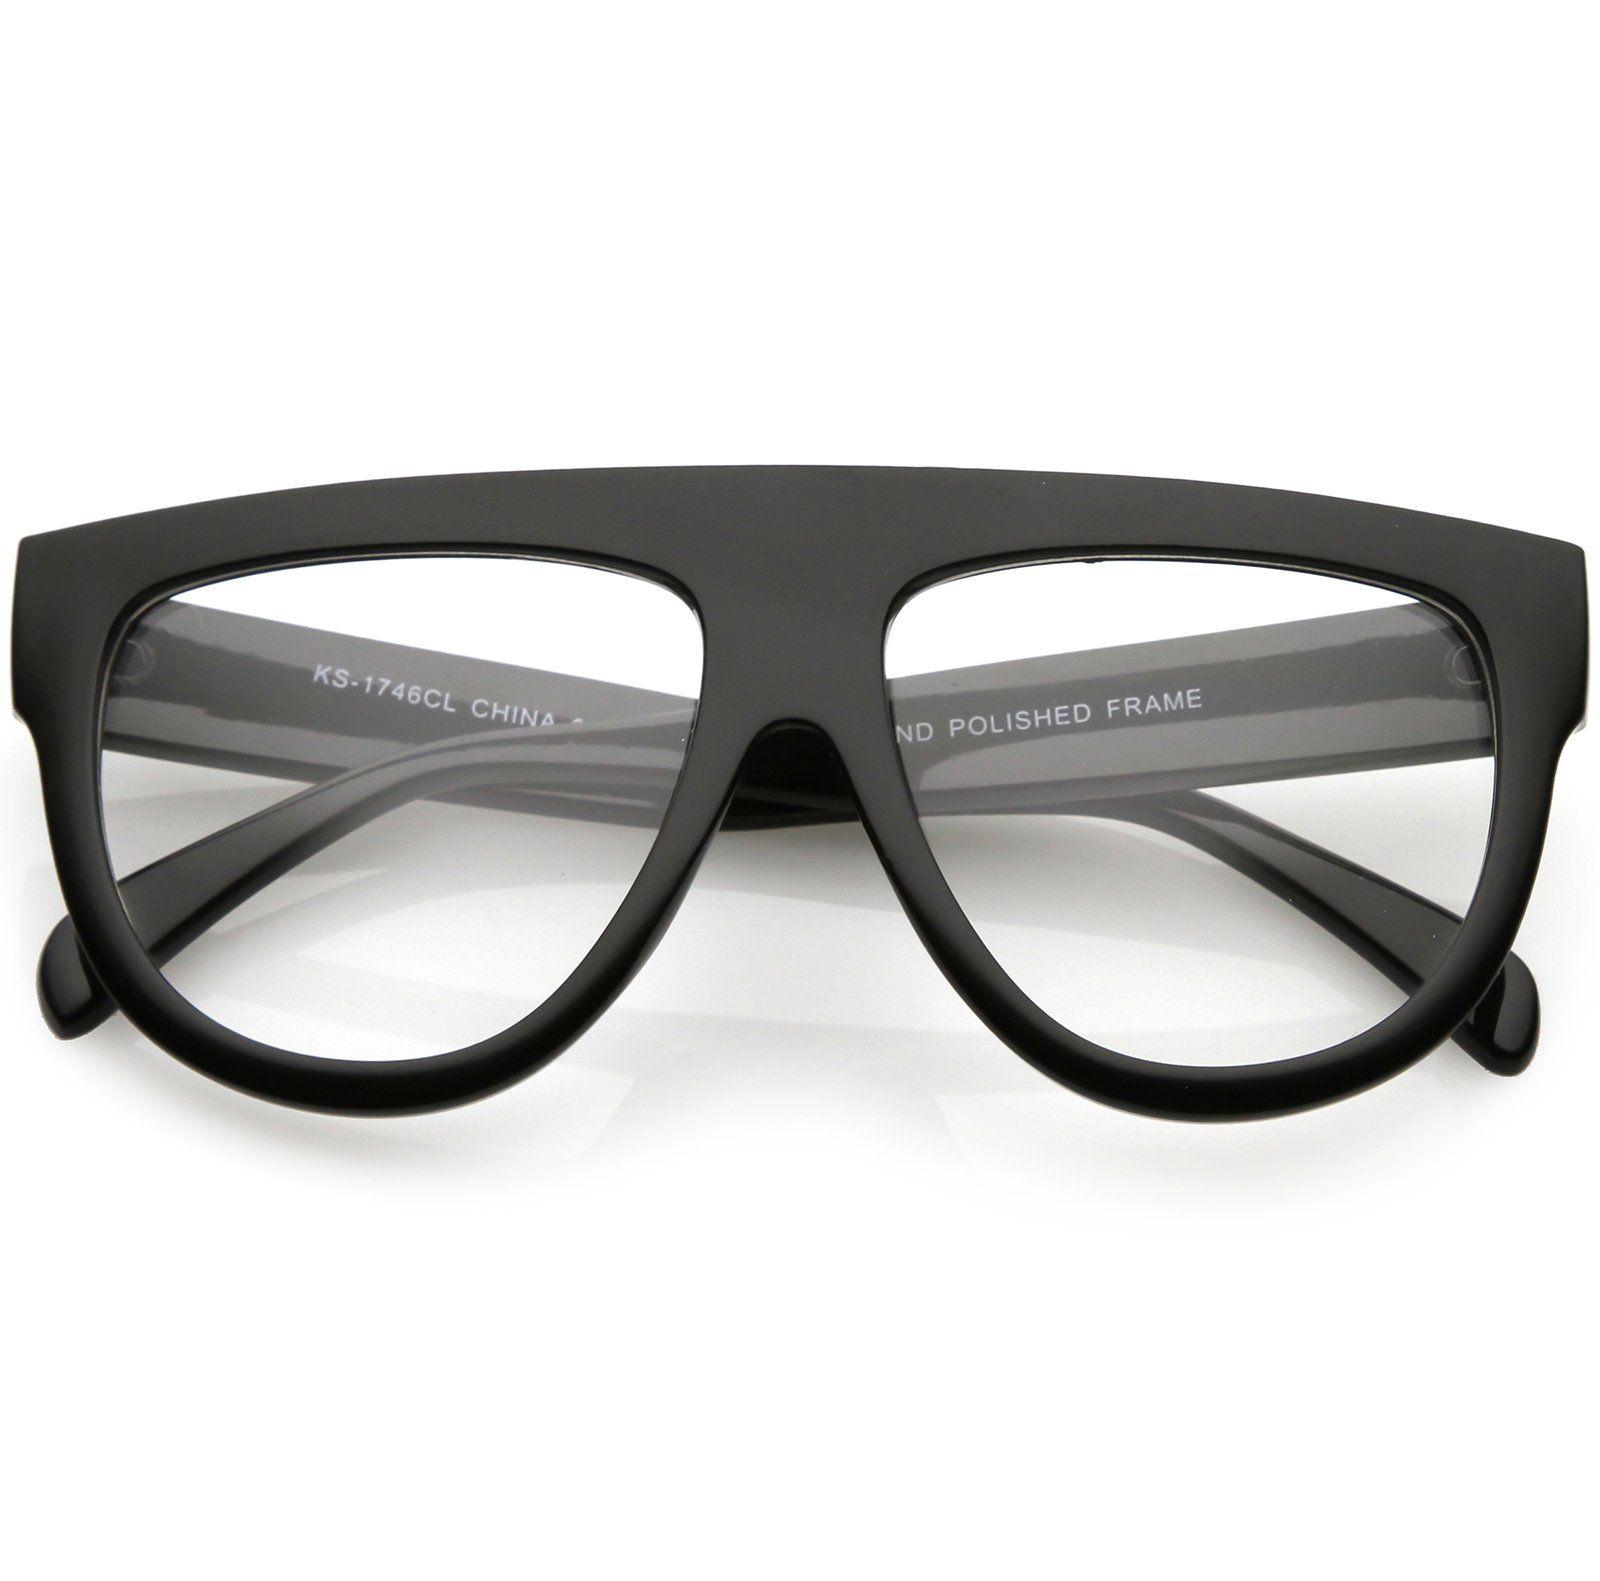 58eb2b042c9 Oversize Flat Top Aviator Eyeglasses Horn Rimmed Details Wide Arms Clear Lens  56mm